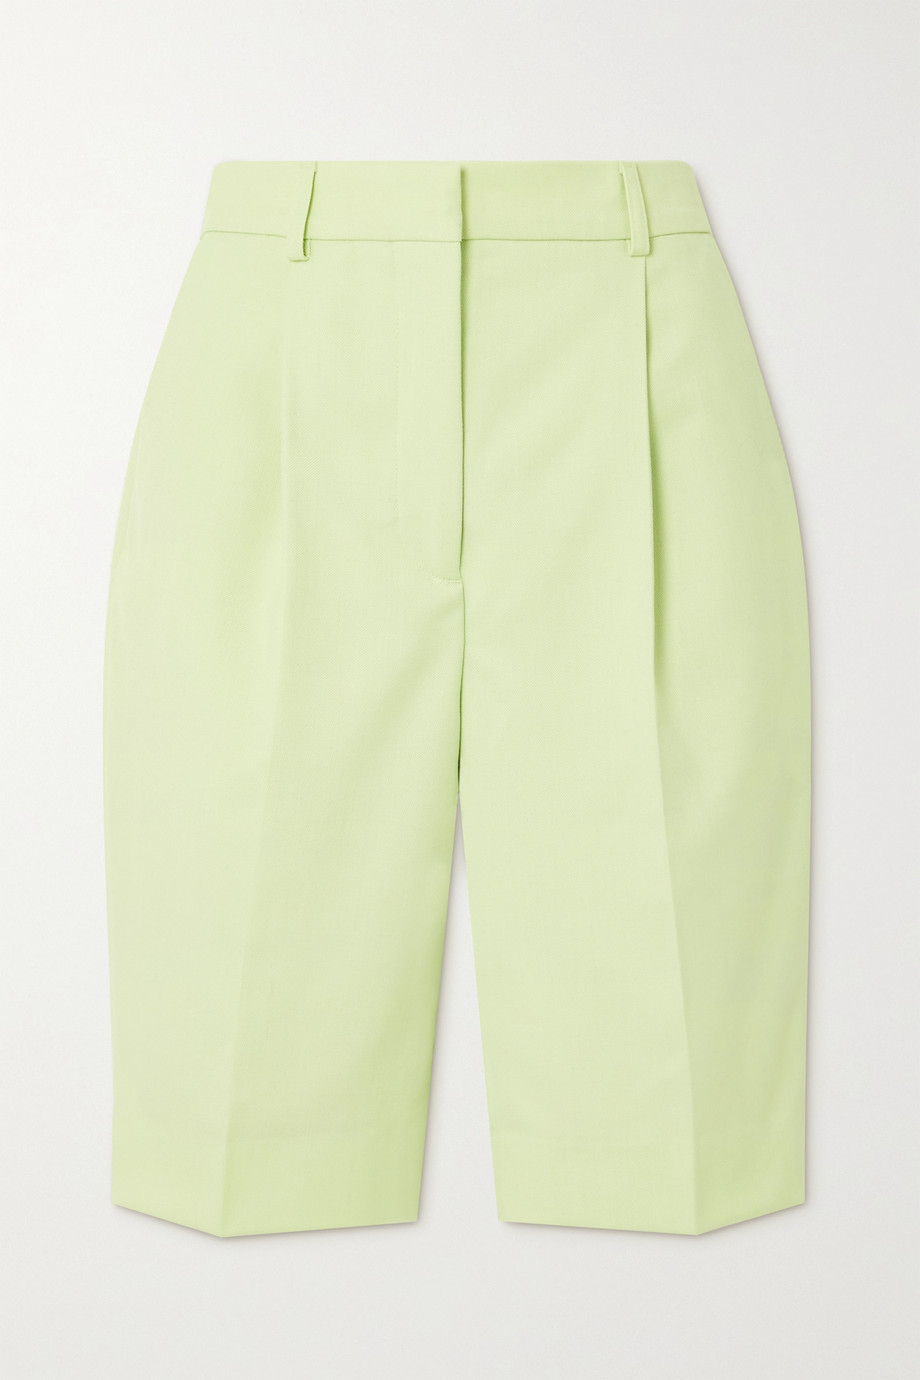 Acne Studios 梭织短裤